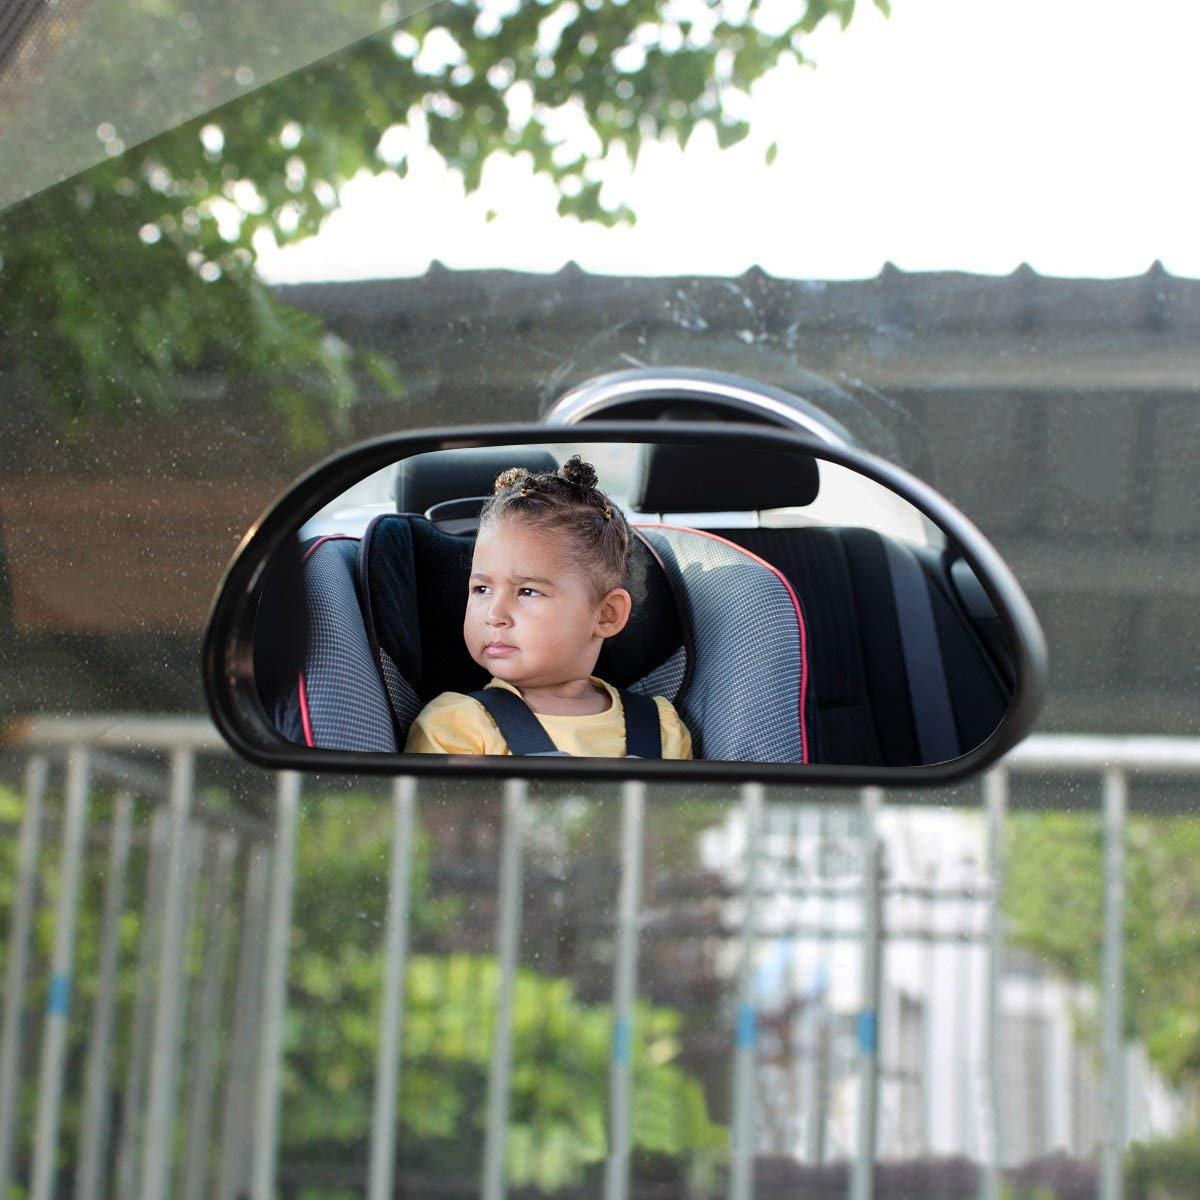 Espejo retrovisor para beb/é Espejo retrovisor de Seguridad Ajustable para beb/és 5.78 2.16 DIVISTAR Espejo retrovisor para Coche